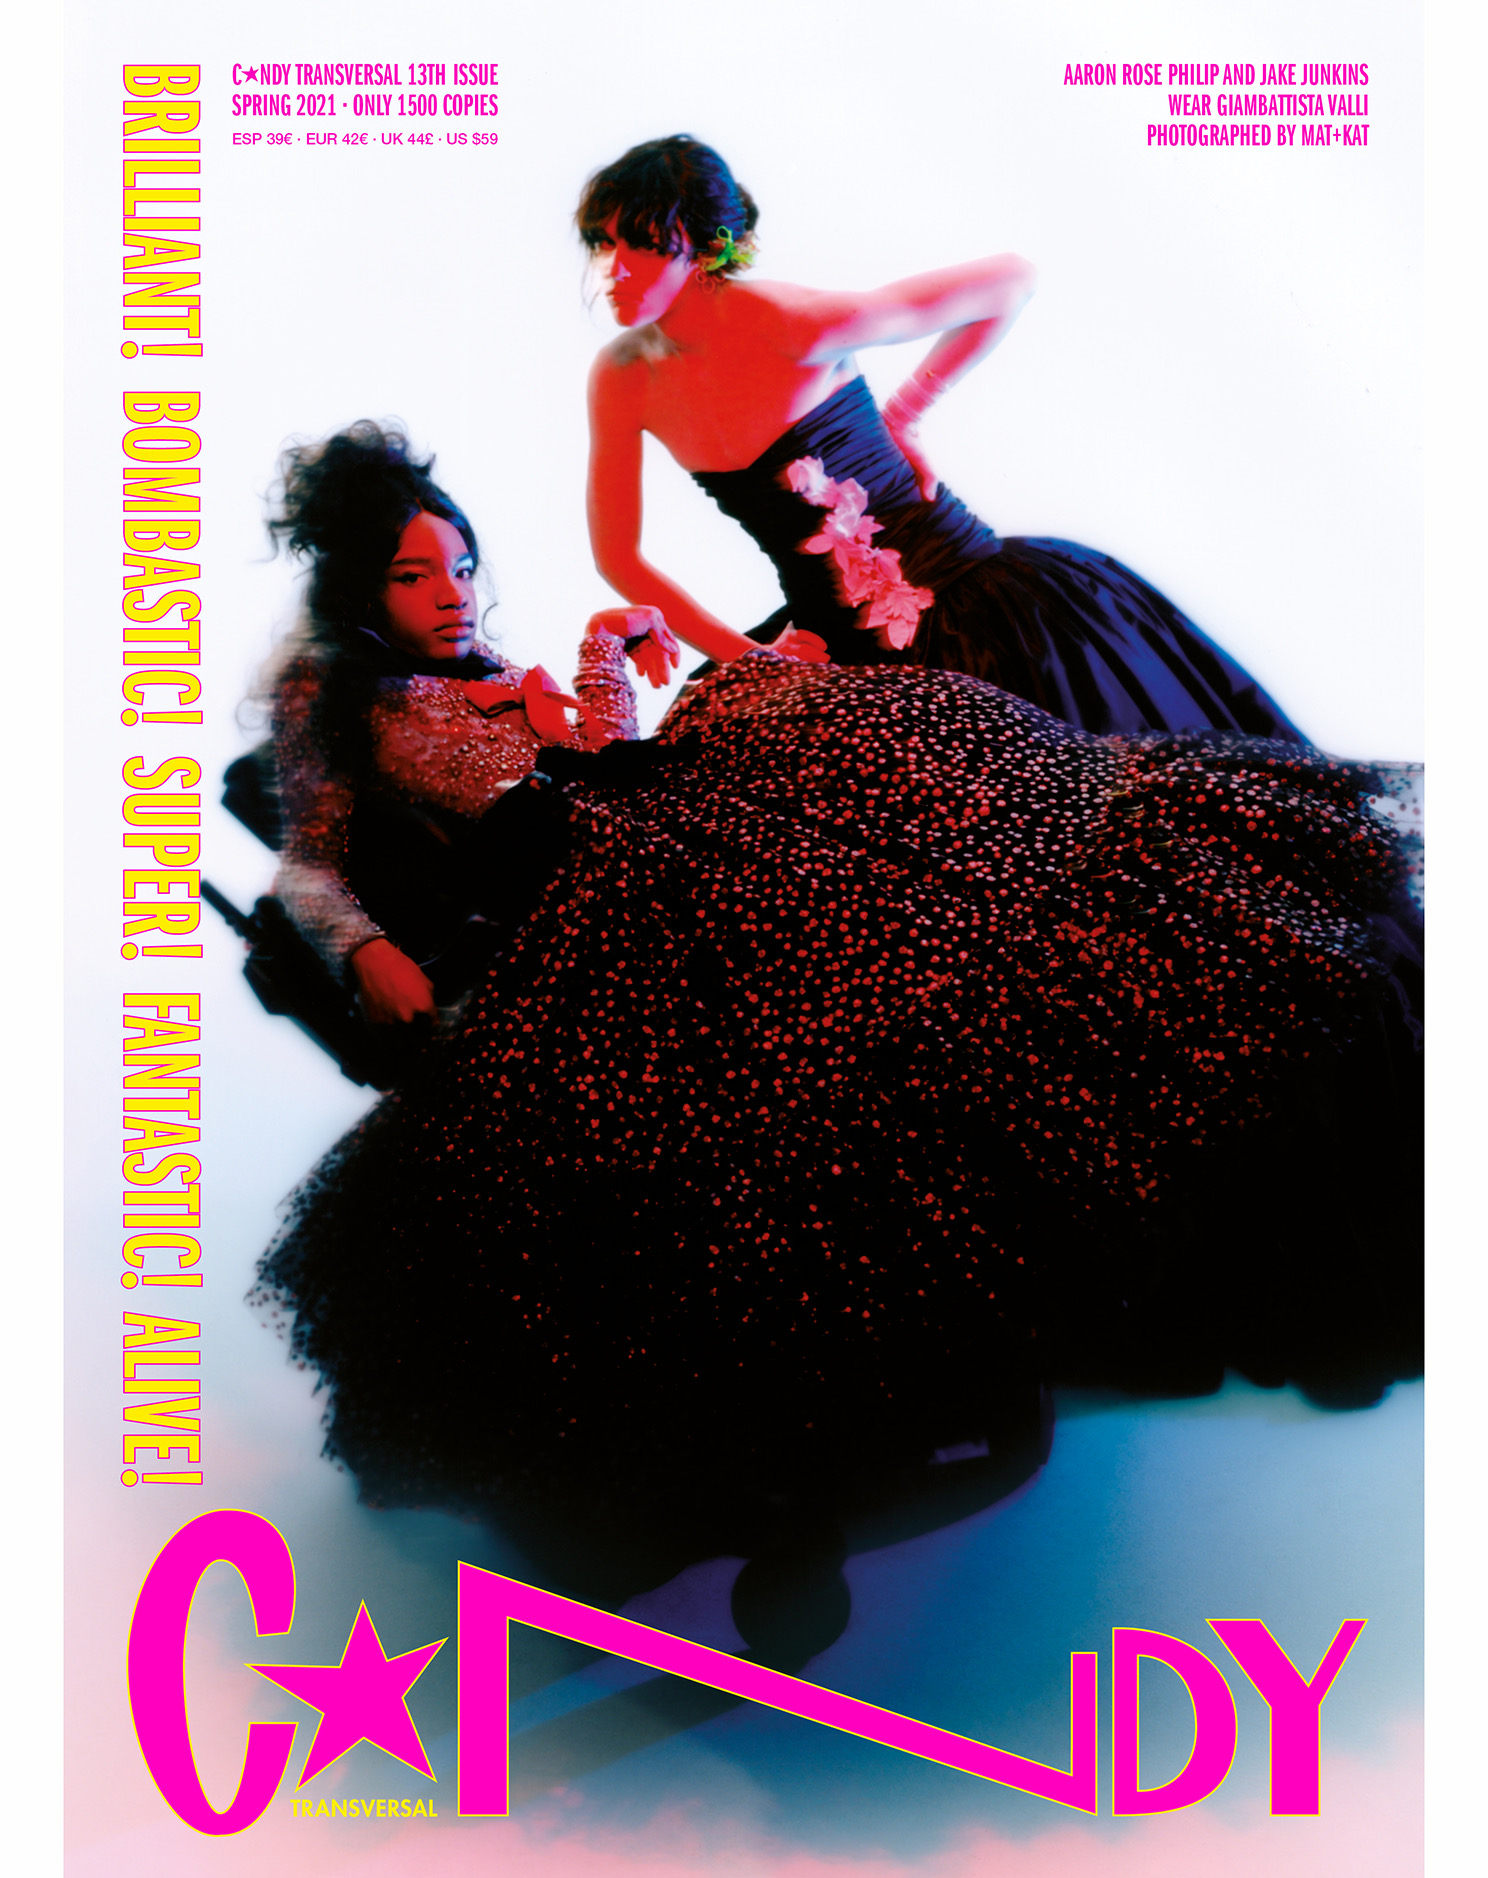 Candy Magazine Ft. Aaron Philip + Jake Junkins